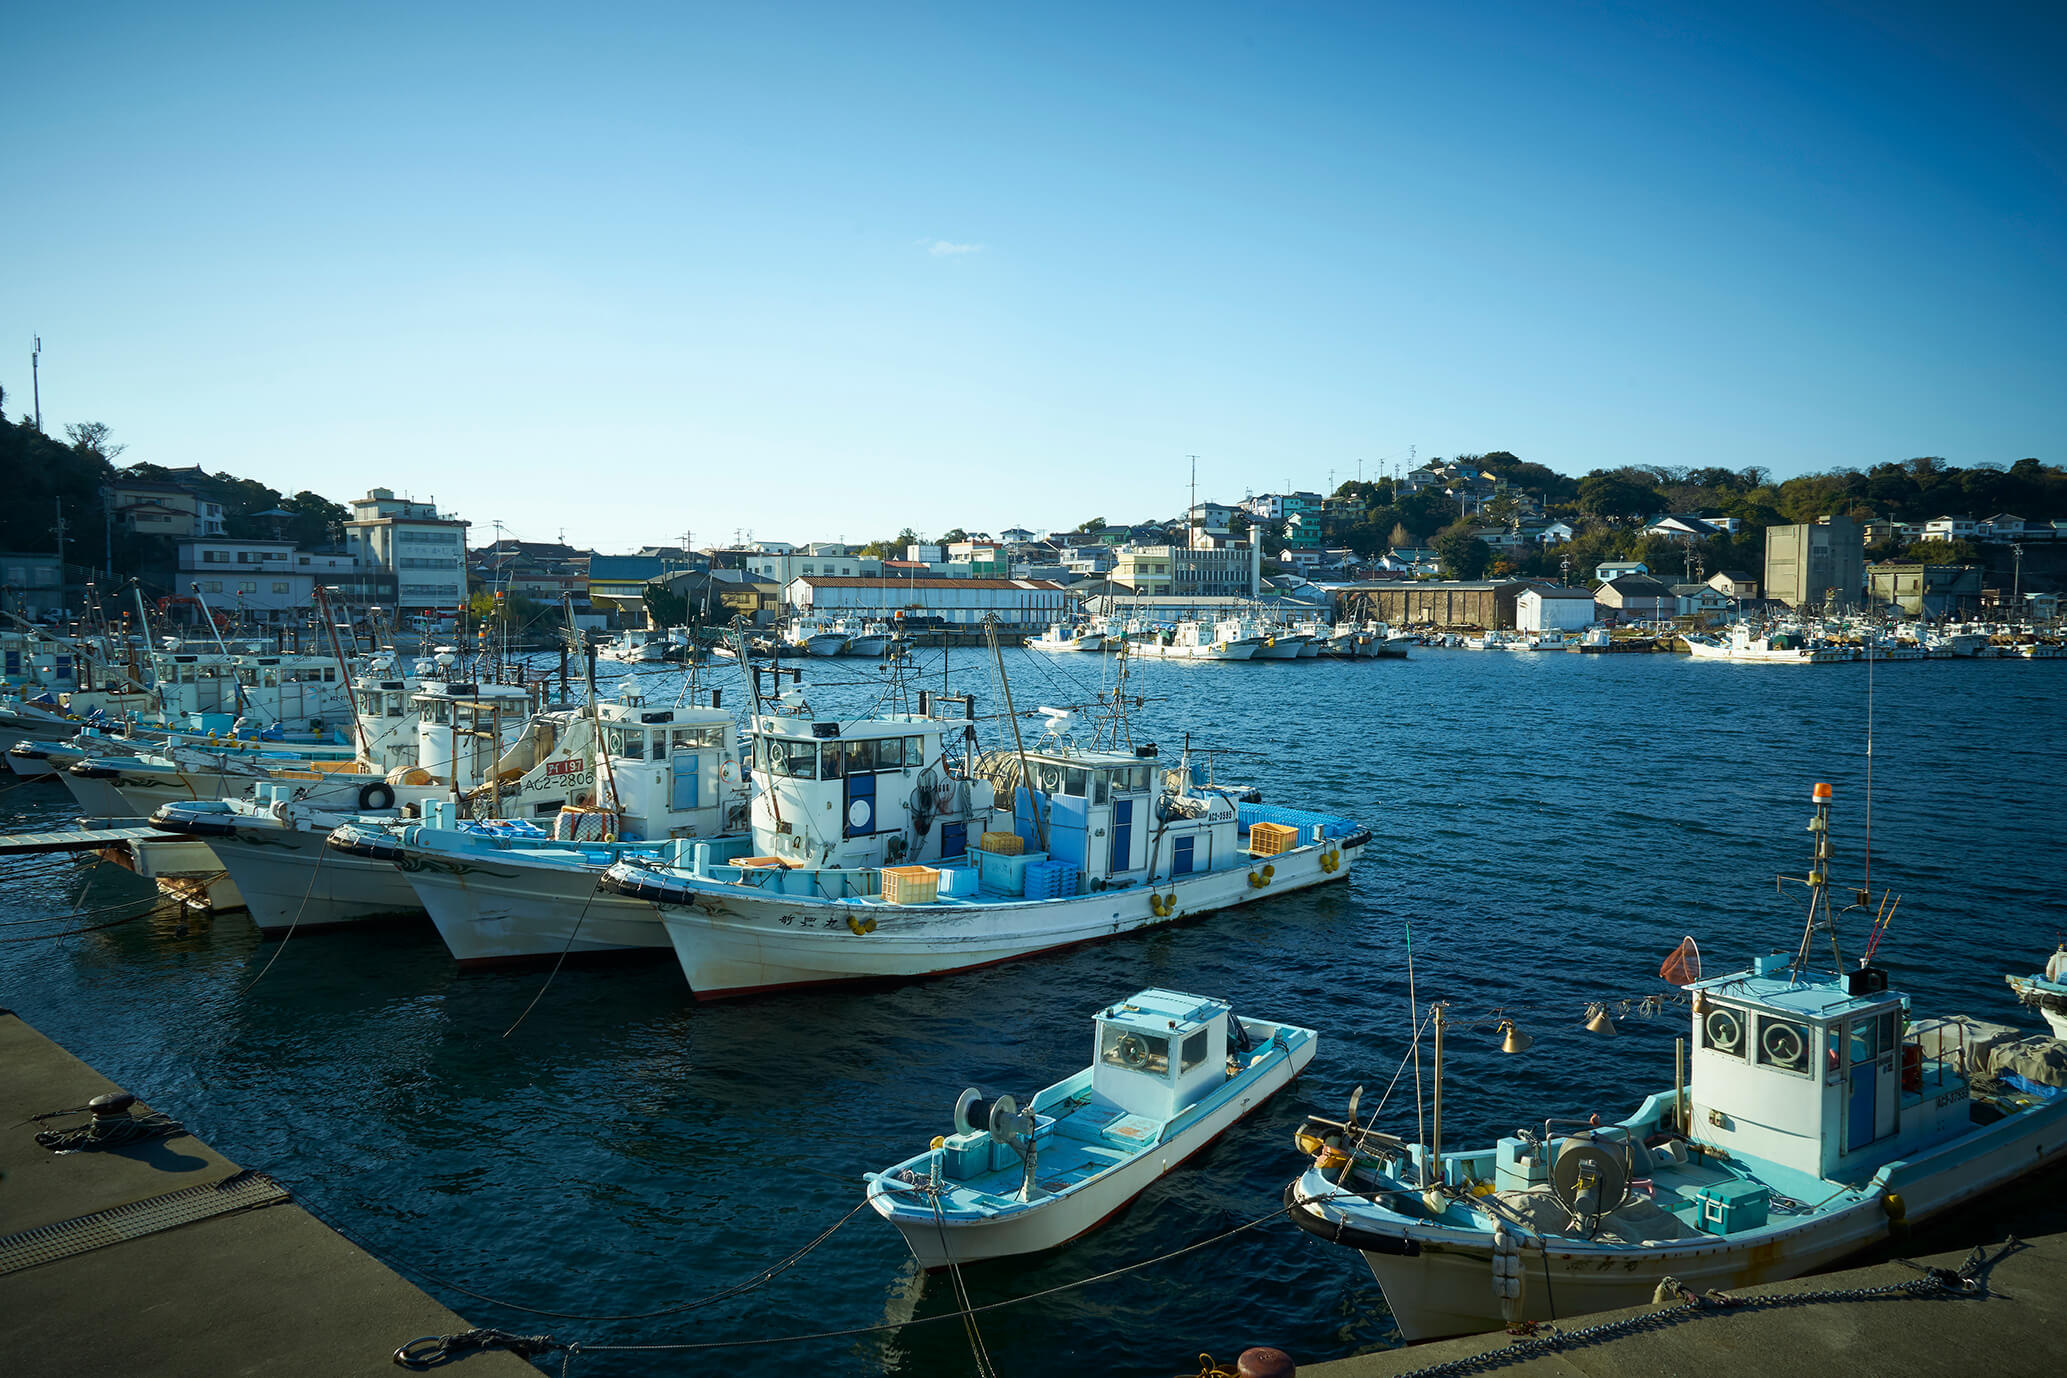 青い篠島漁港